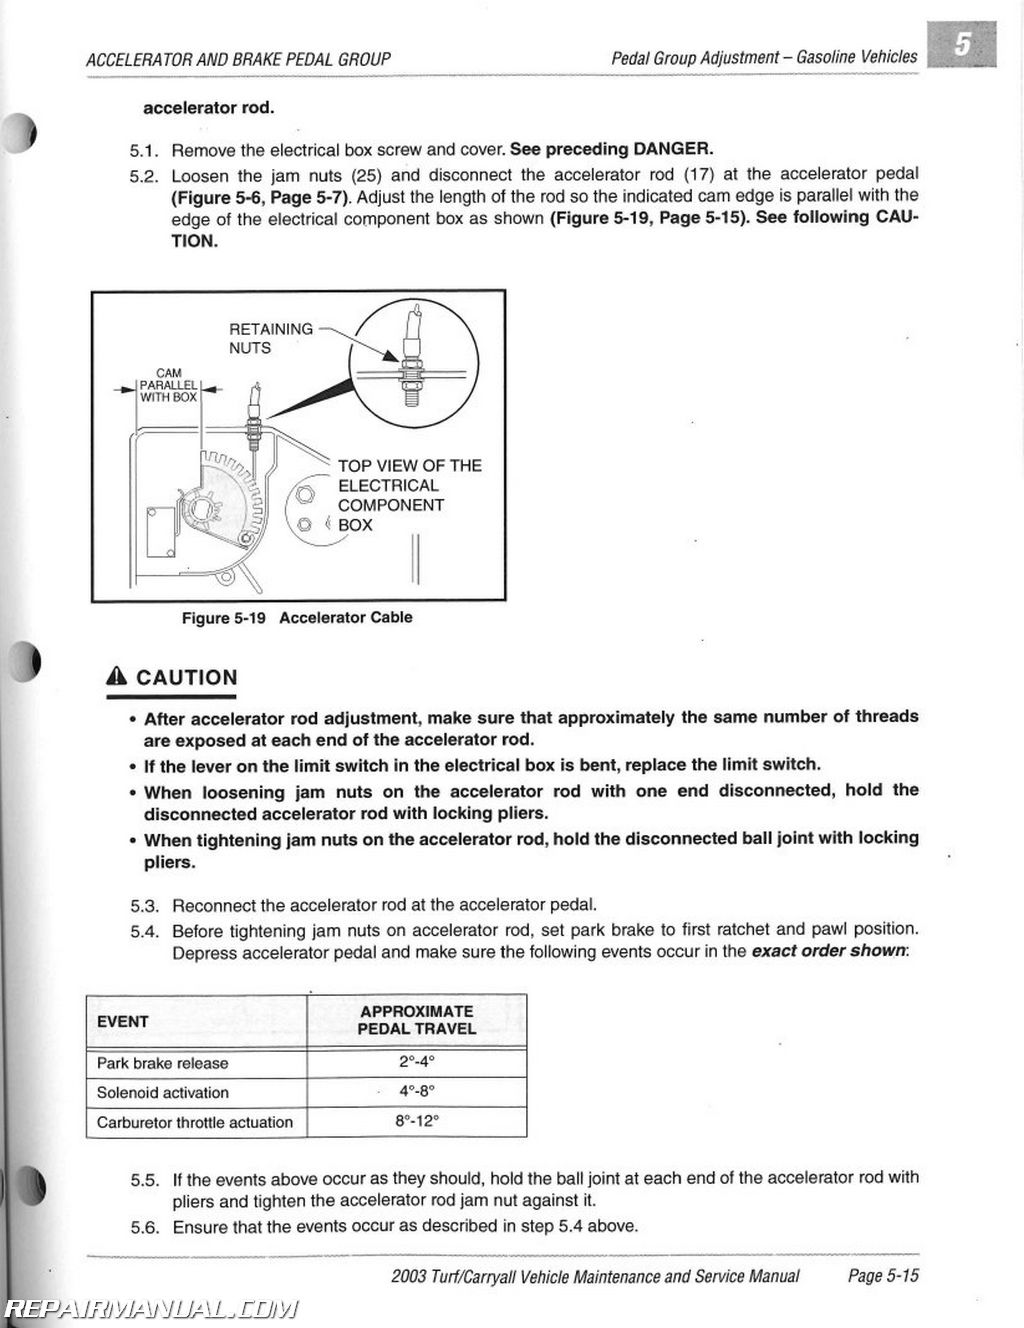 2003 Club Car Turf / 2 / 6 / Carryall 1 / 2 / 6 / Plus / XRT Gas Electric Golf  Car Service Manual